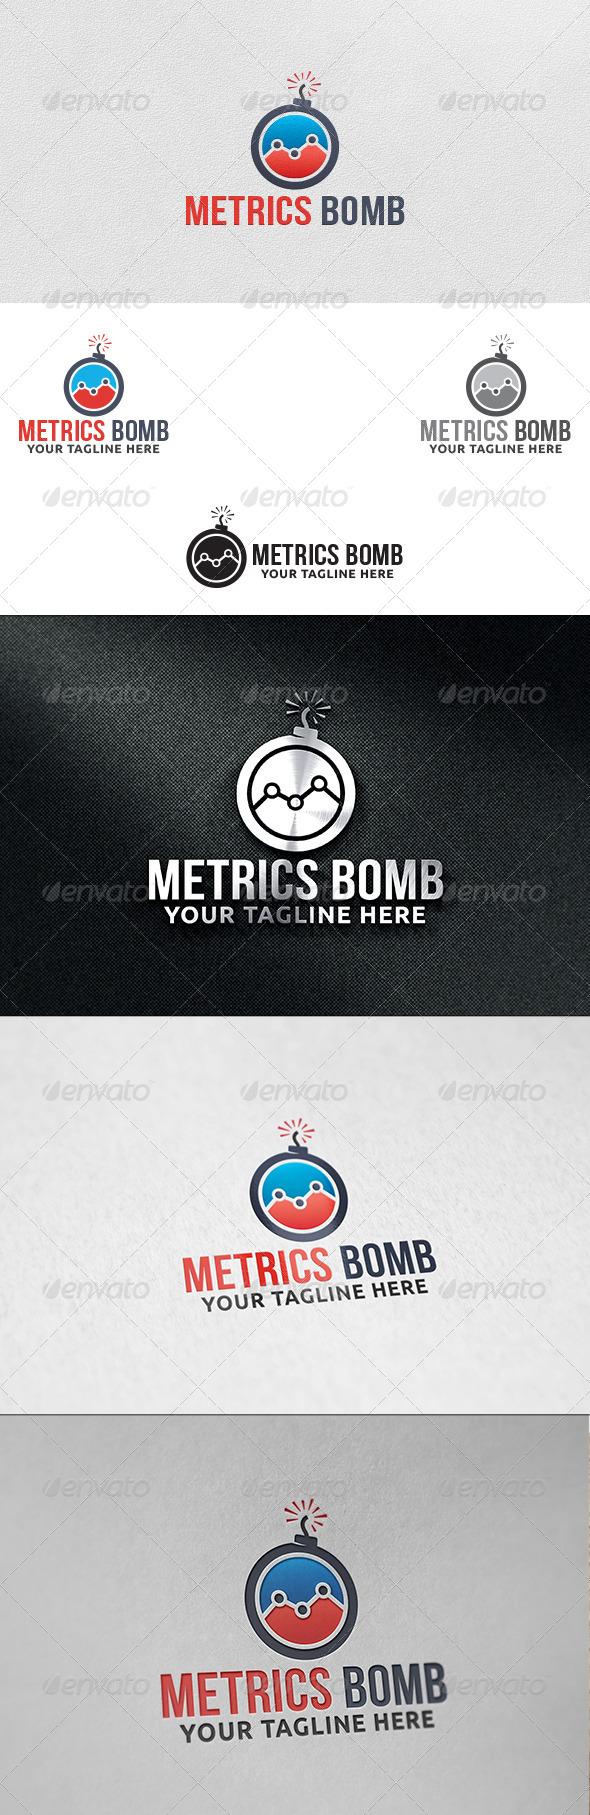 GraphicRiver Metrics Bomb Logo Template 6045941